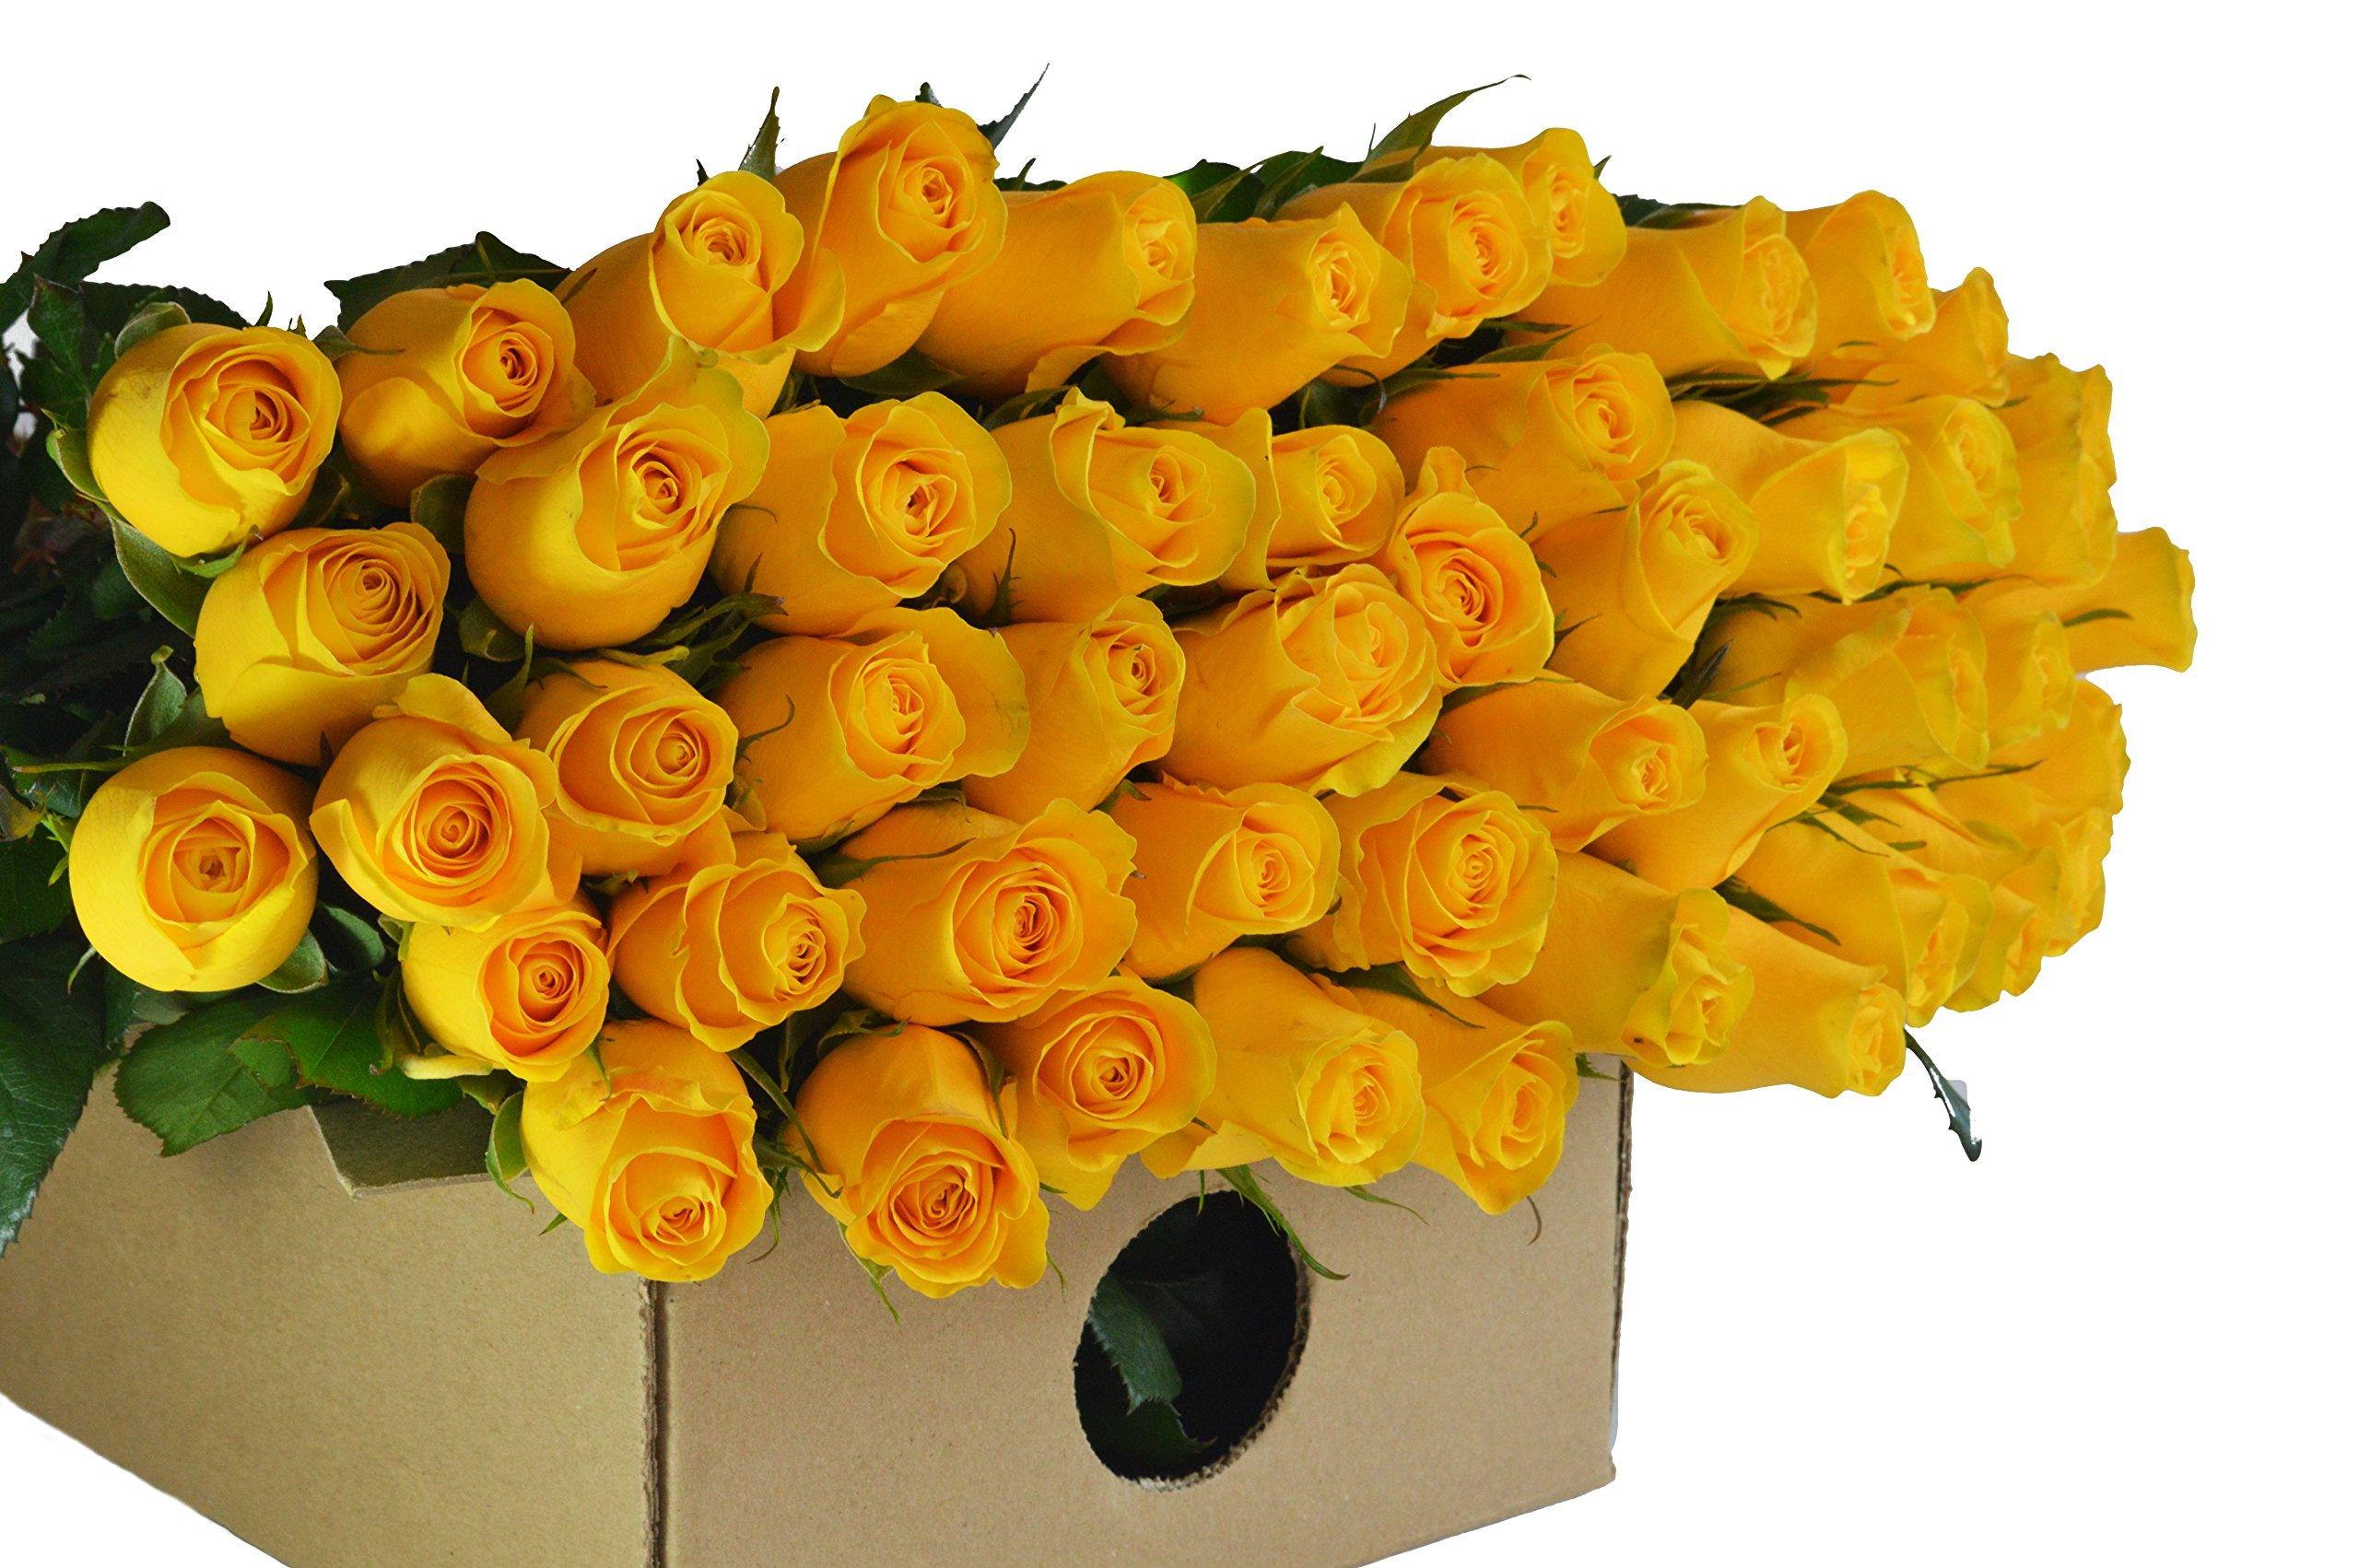 Blooms2Door 100 Yellow Roses (Farm-Fresh, Long Stem - 50cm) - Farm Direct Wholesale Fresh Flowers